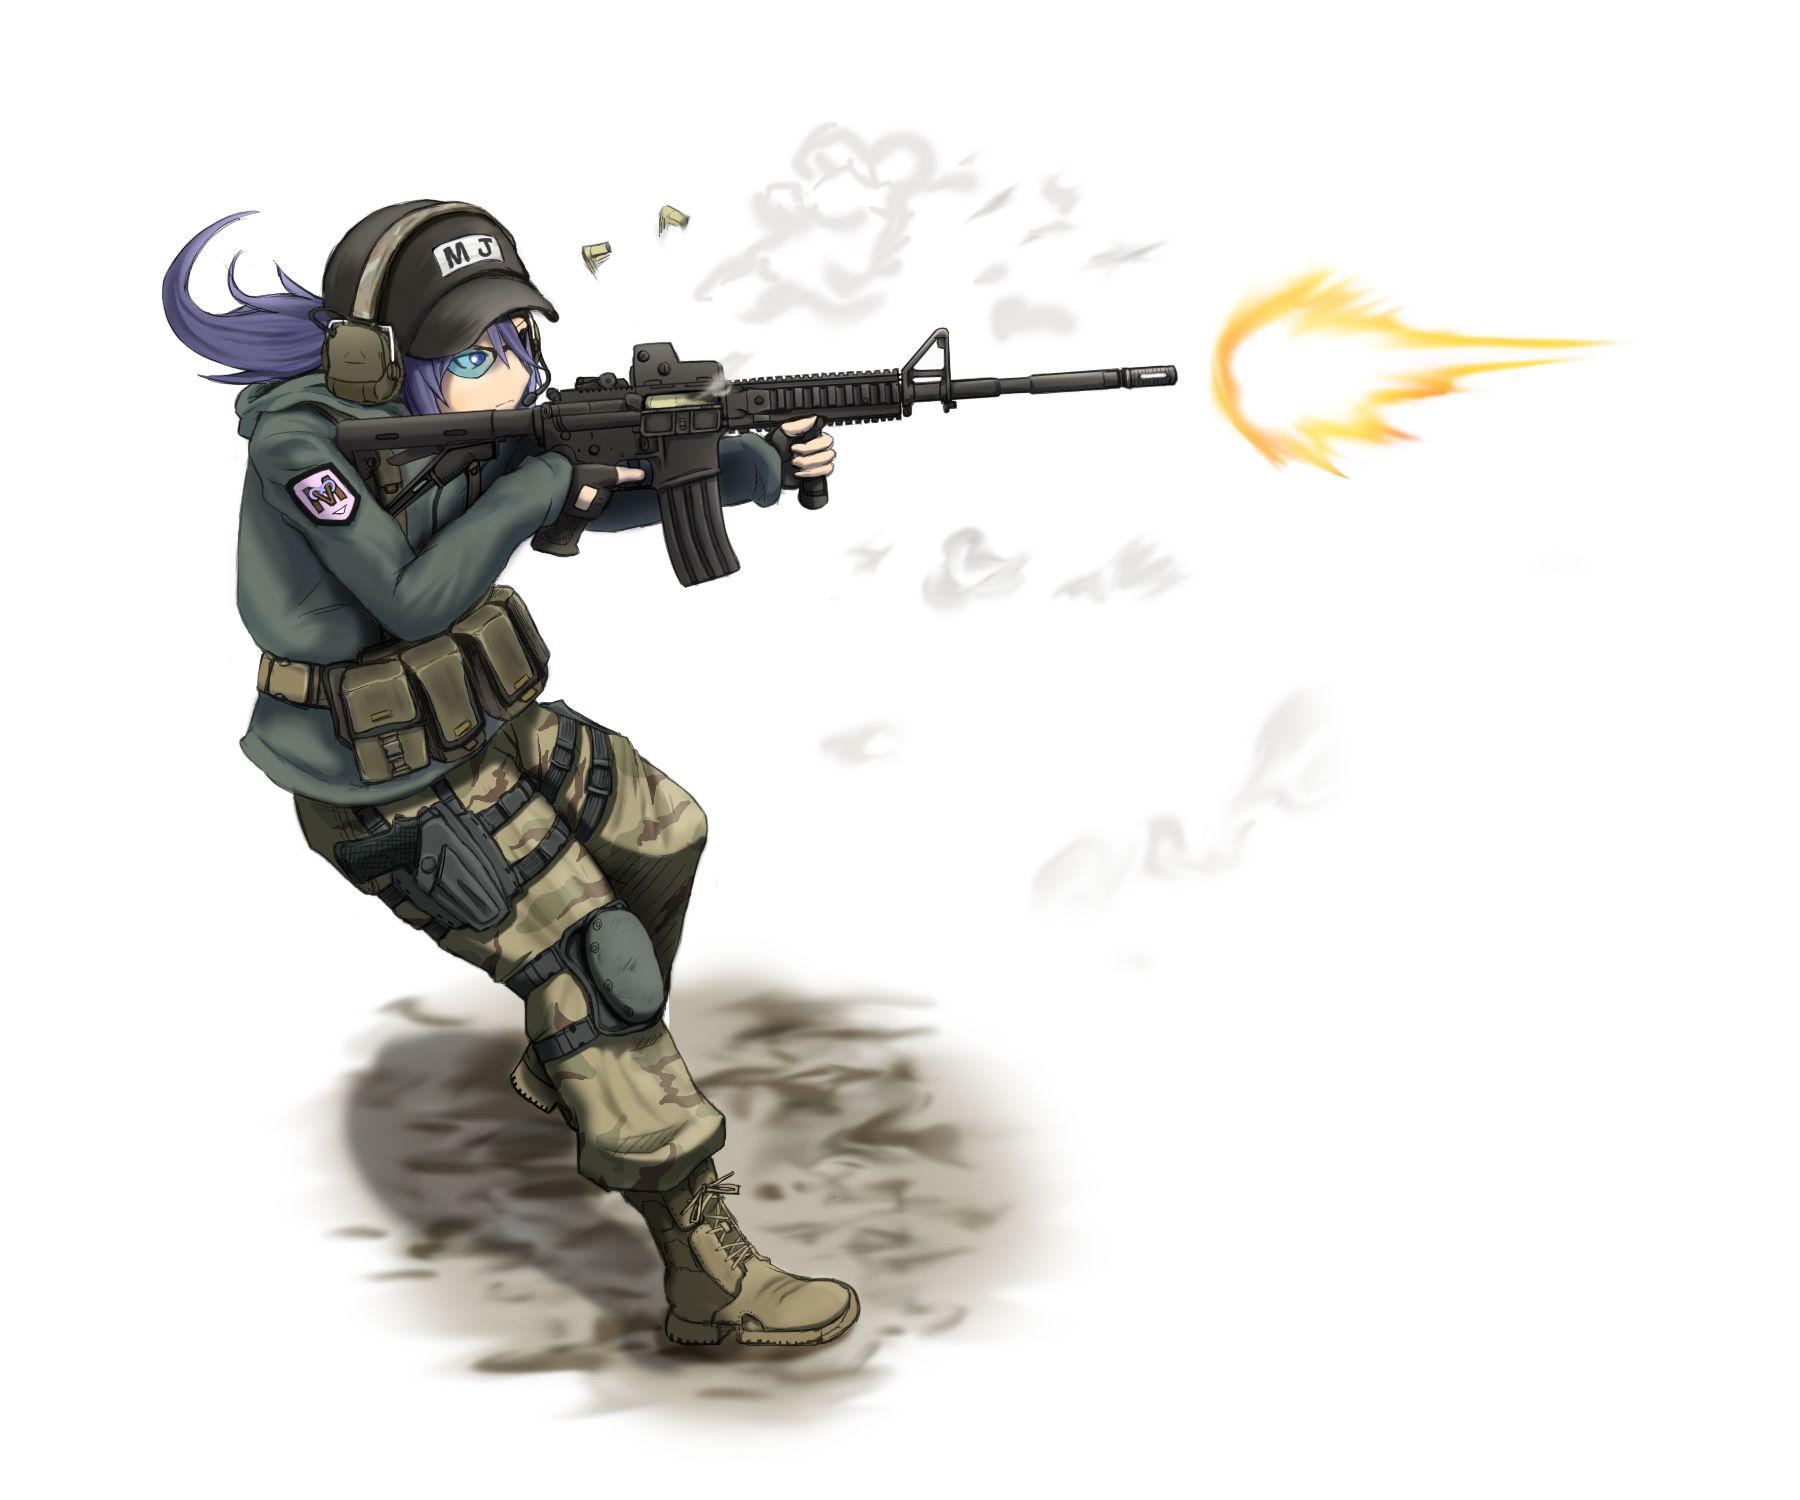 Anime Original Wallpaper Anime military, Anime weapons